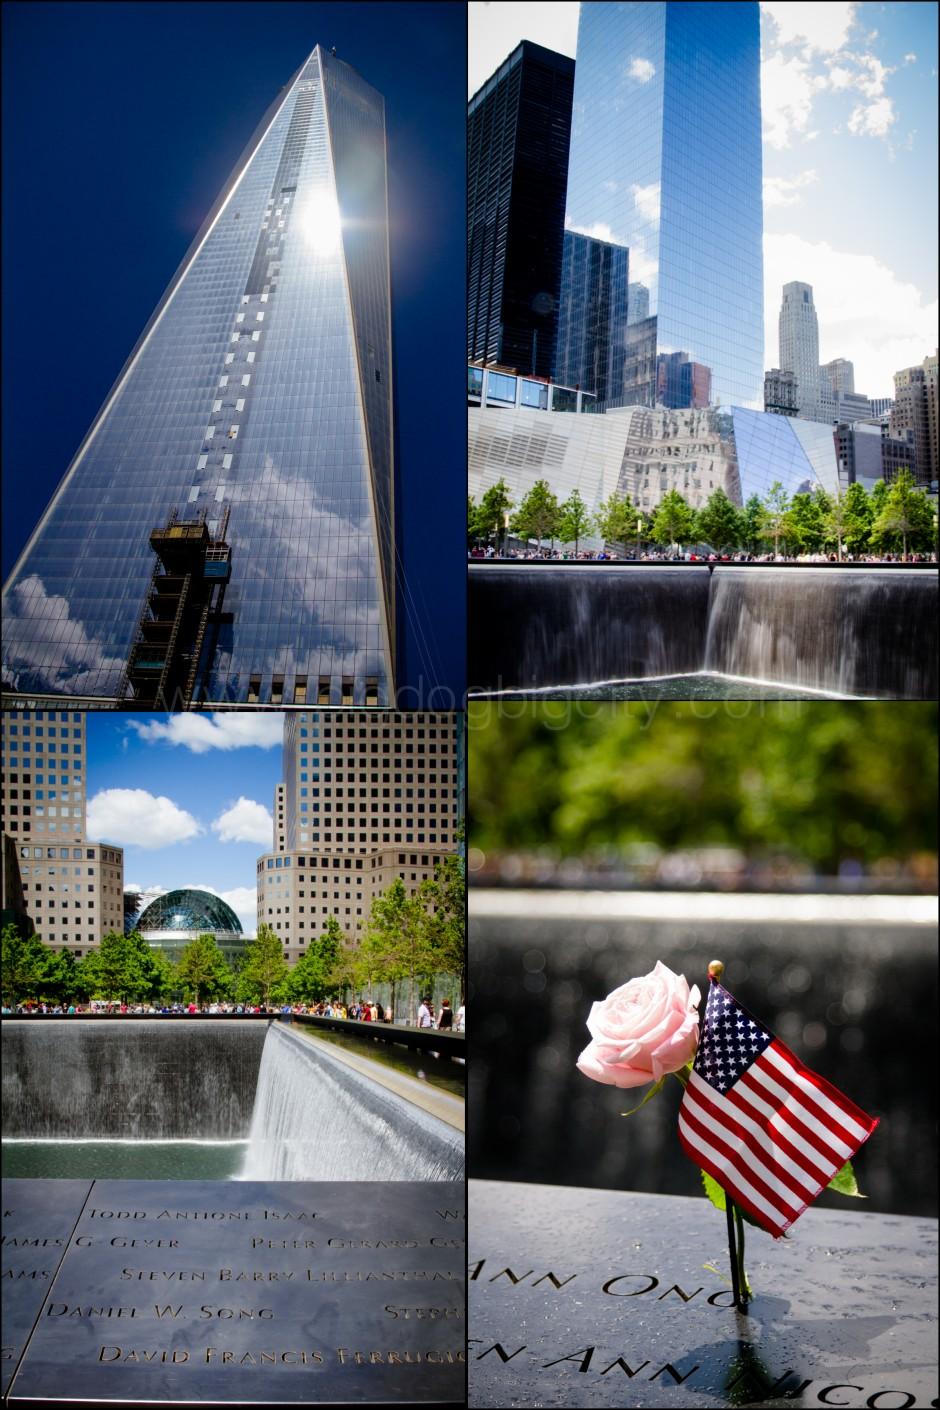 9-11 Blog 3